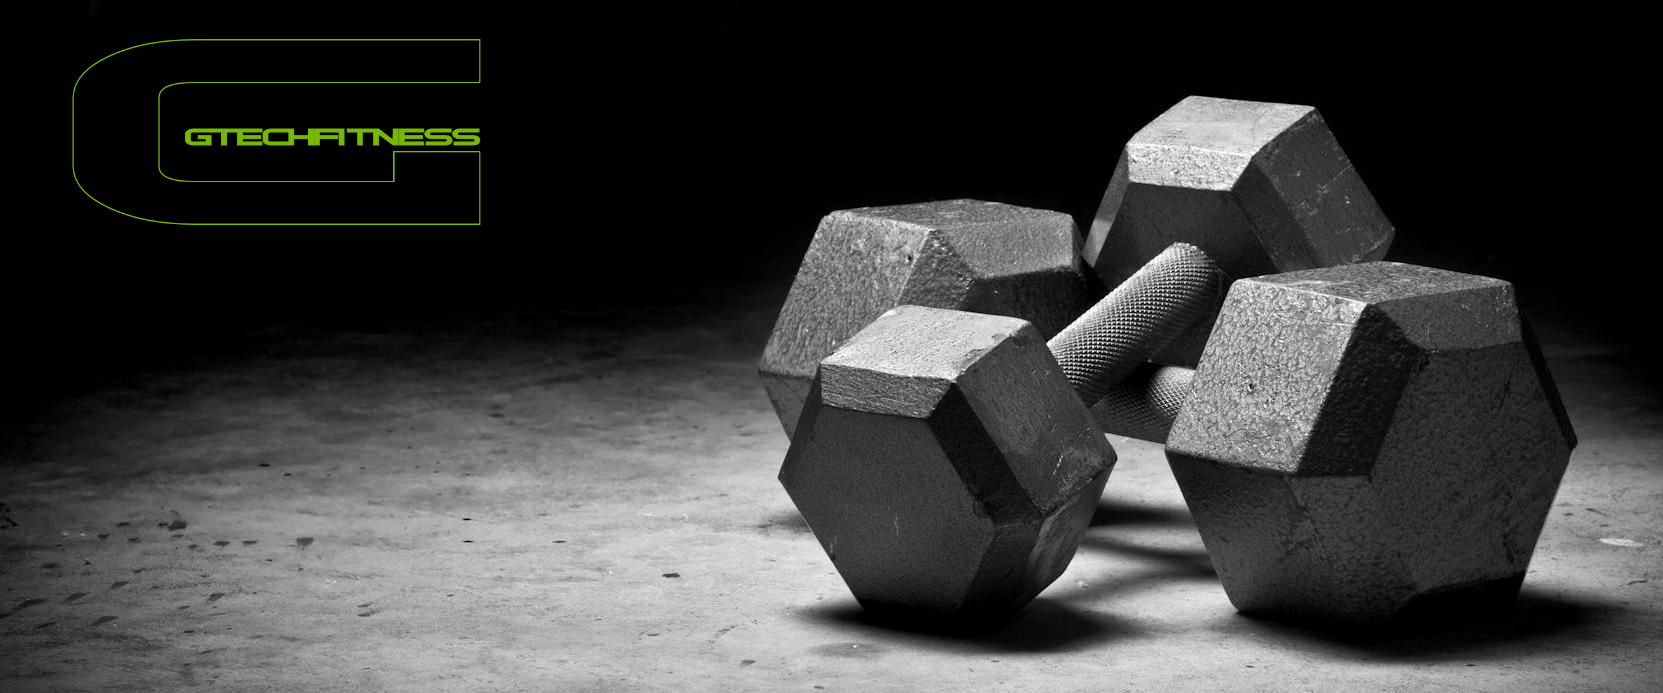 Gtech Fitness Weight Training Equipment Logo Image